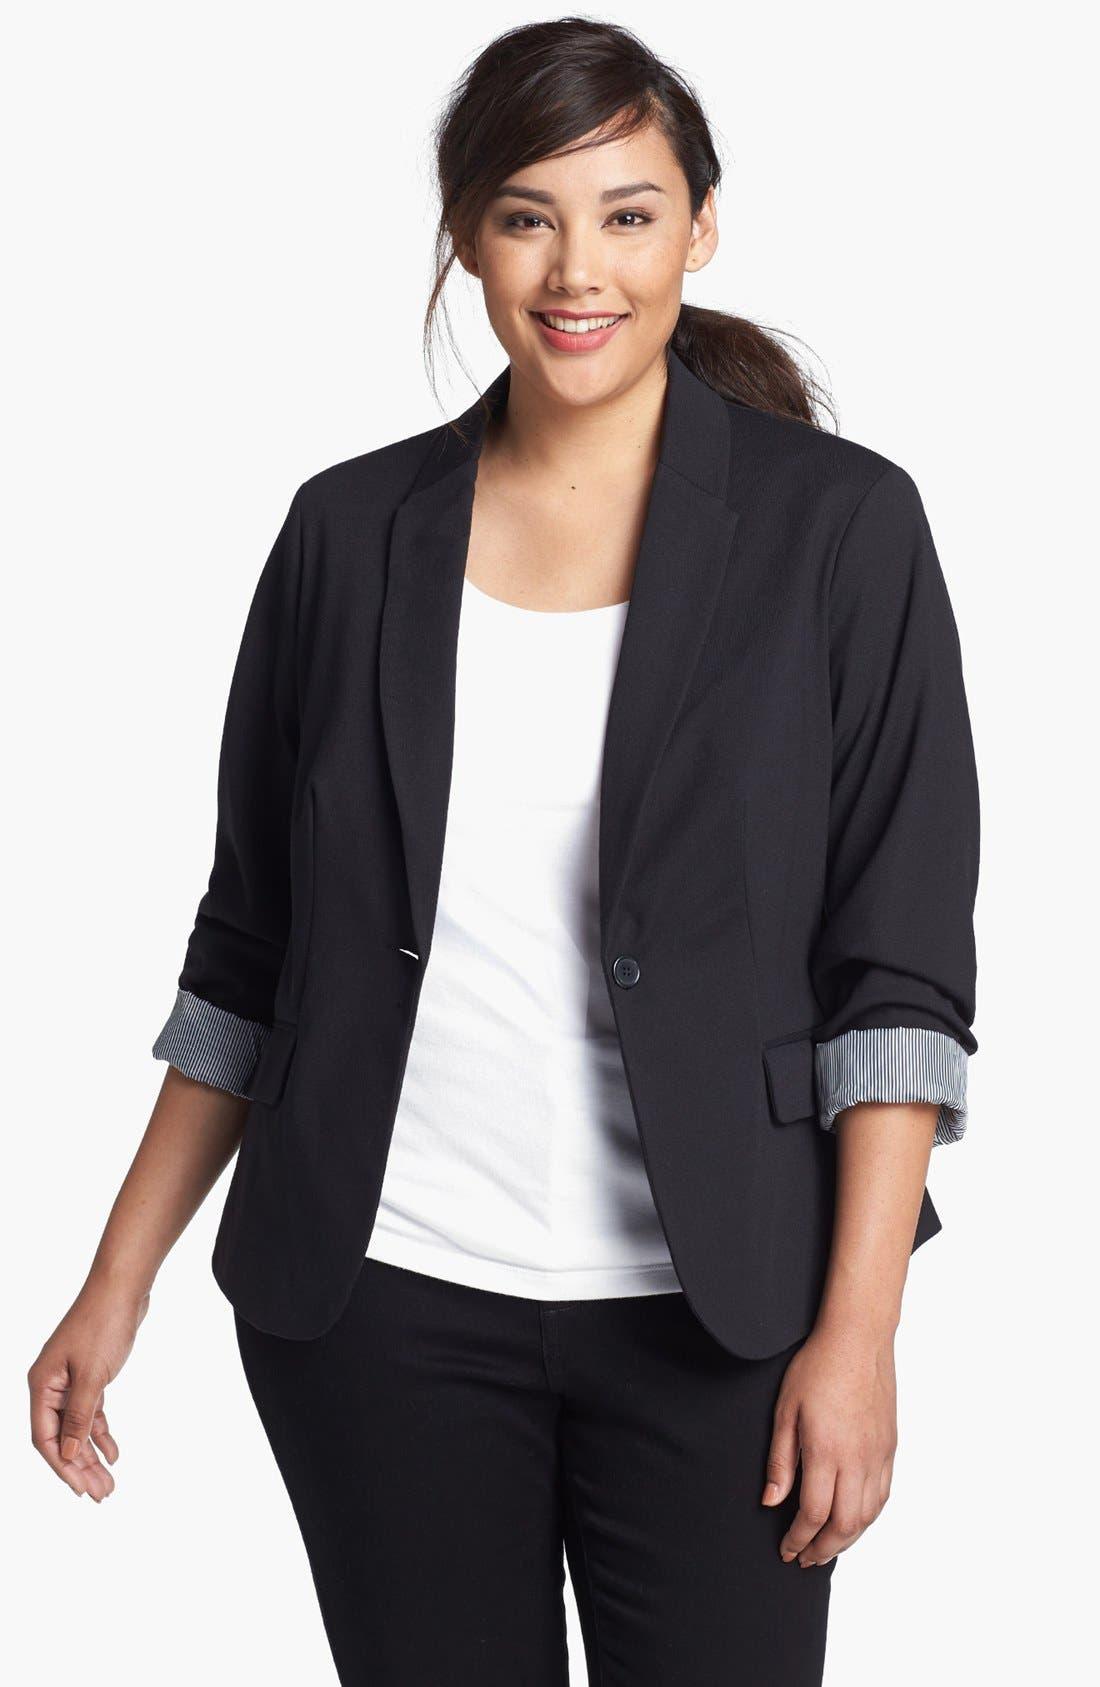 Alternate Image 1 Selected - Evans Single Button Blazer (Plus Size)